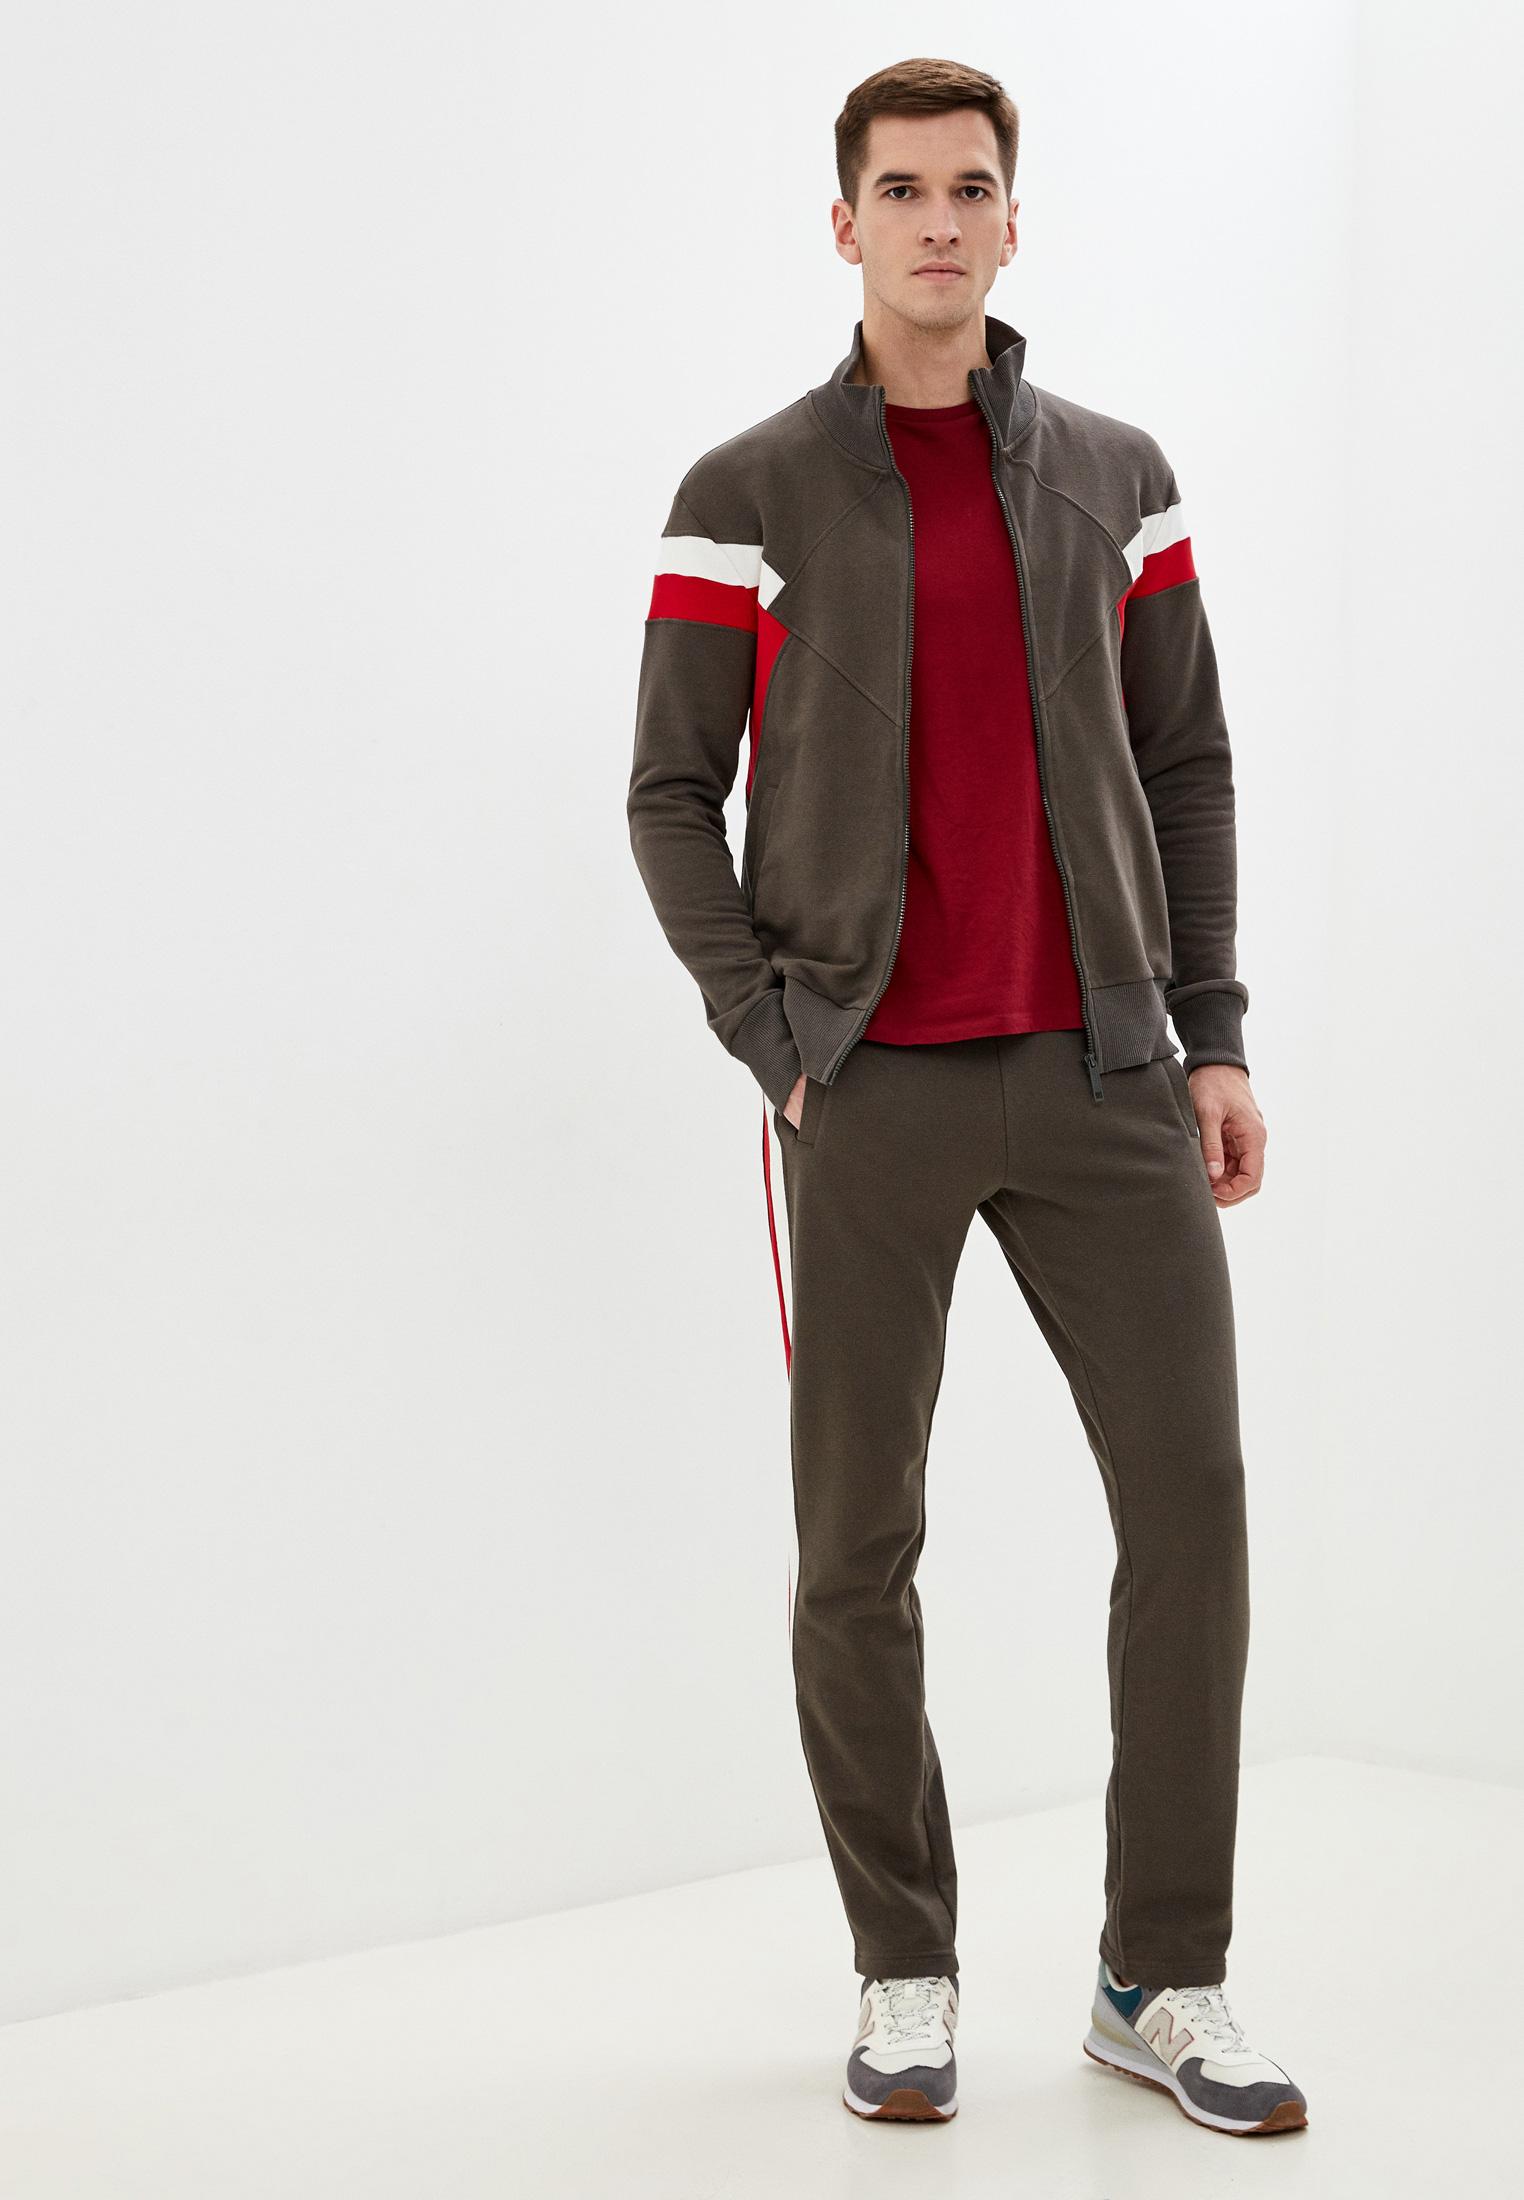 Спортивный костюм Sitlly 20802